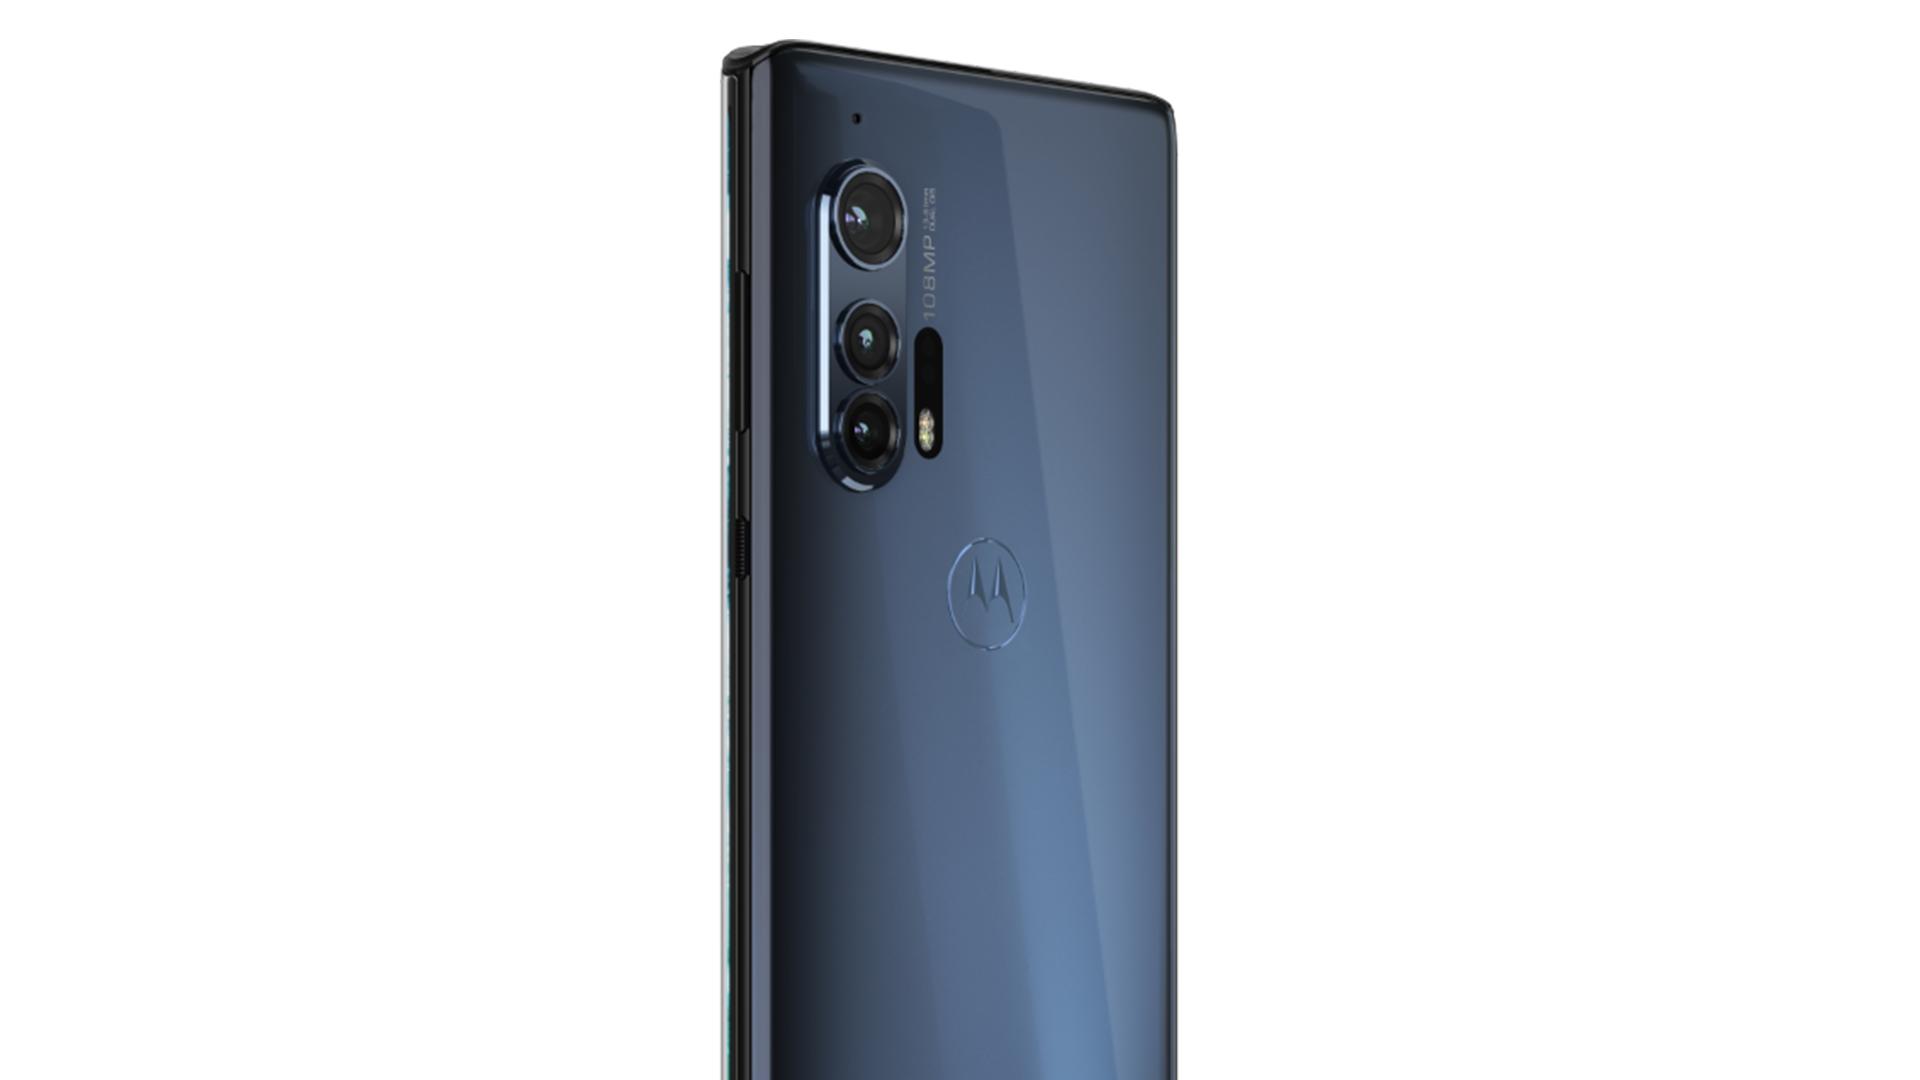 A photo of the Motorola Edge+.